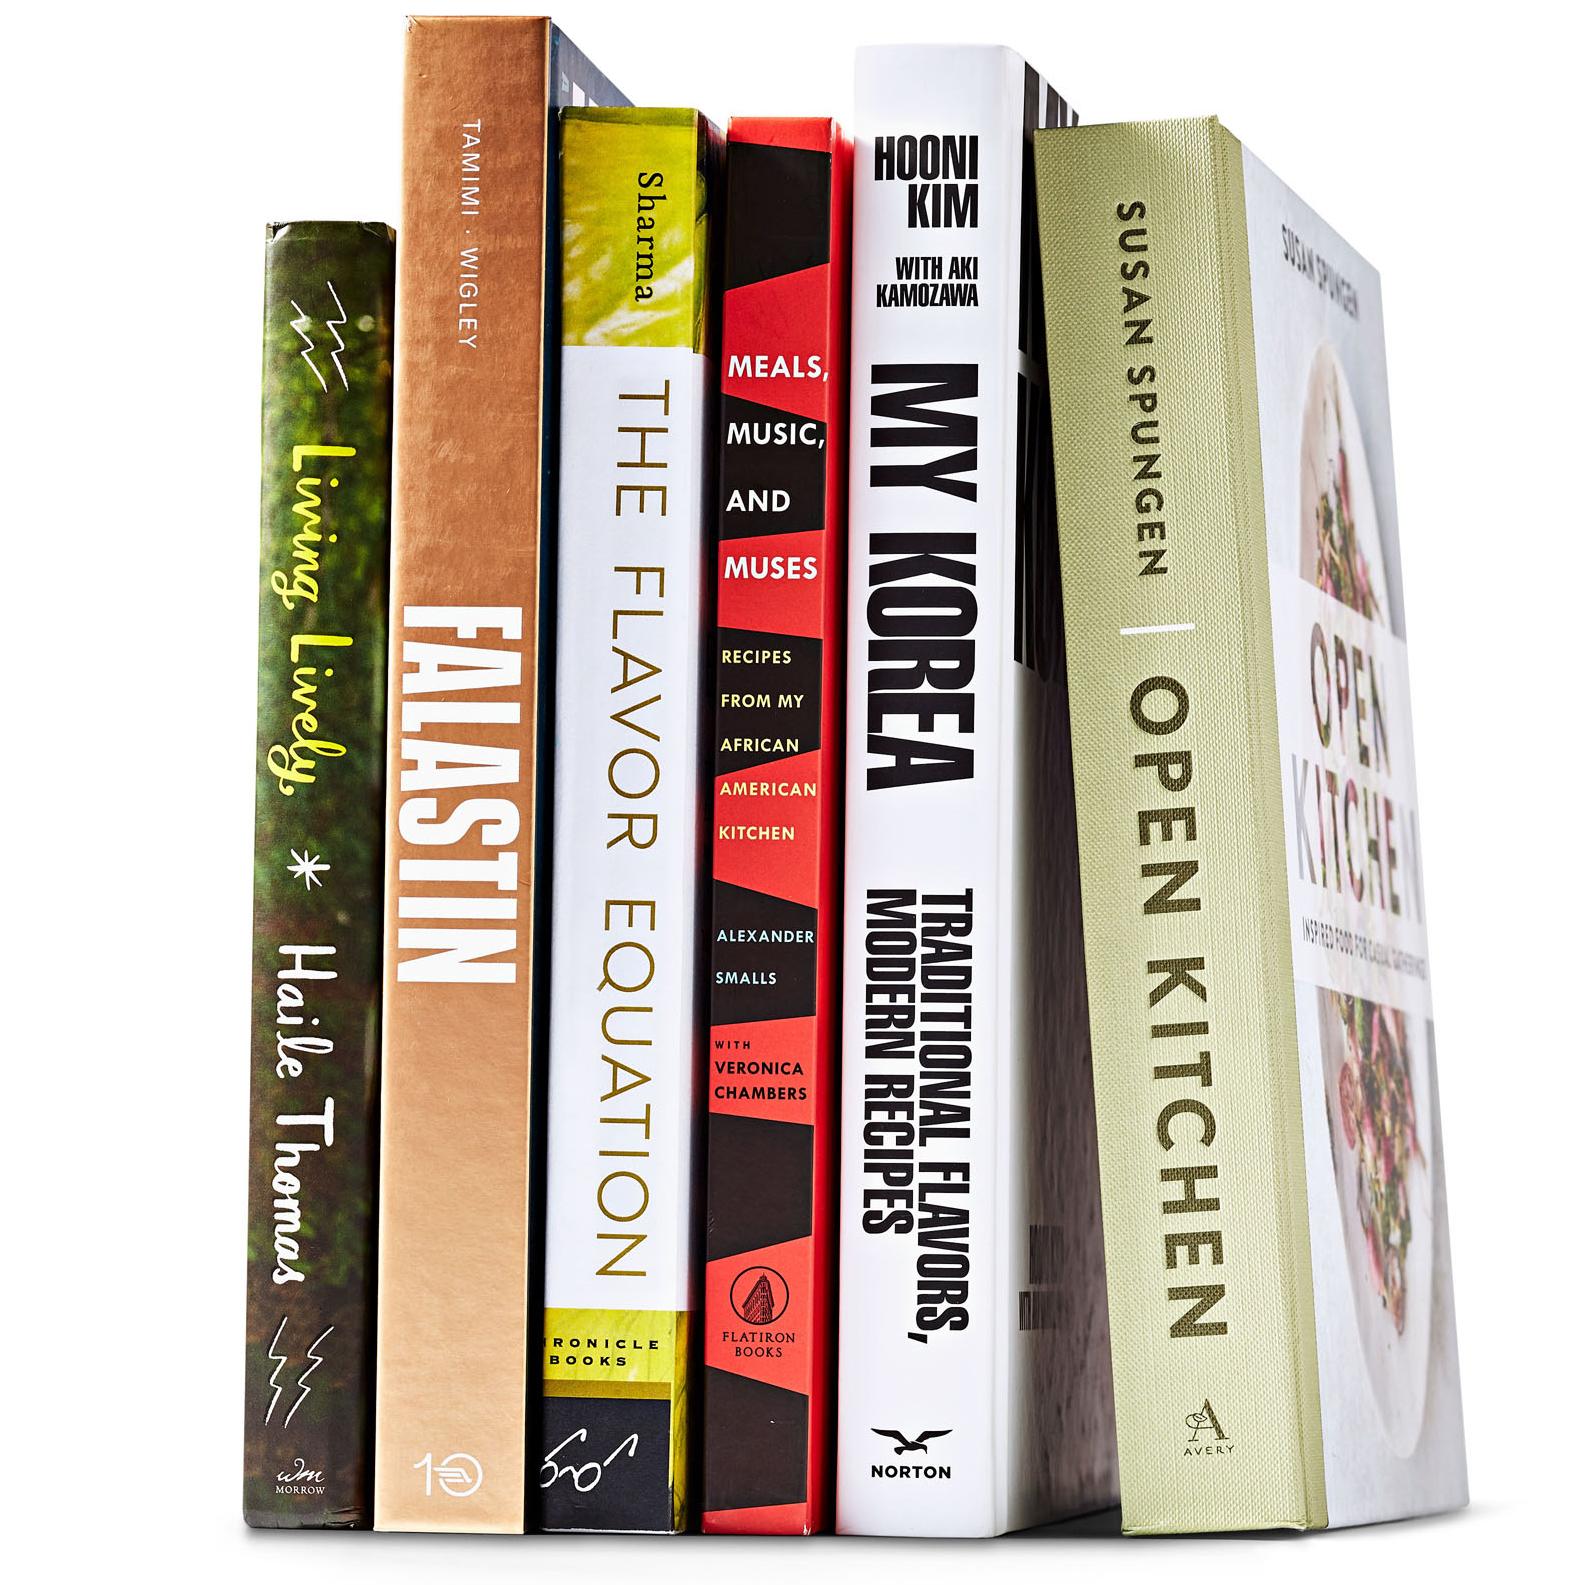 six cookbooks lined up